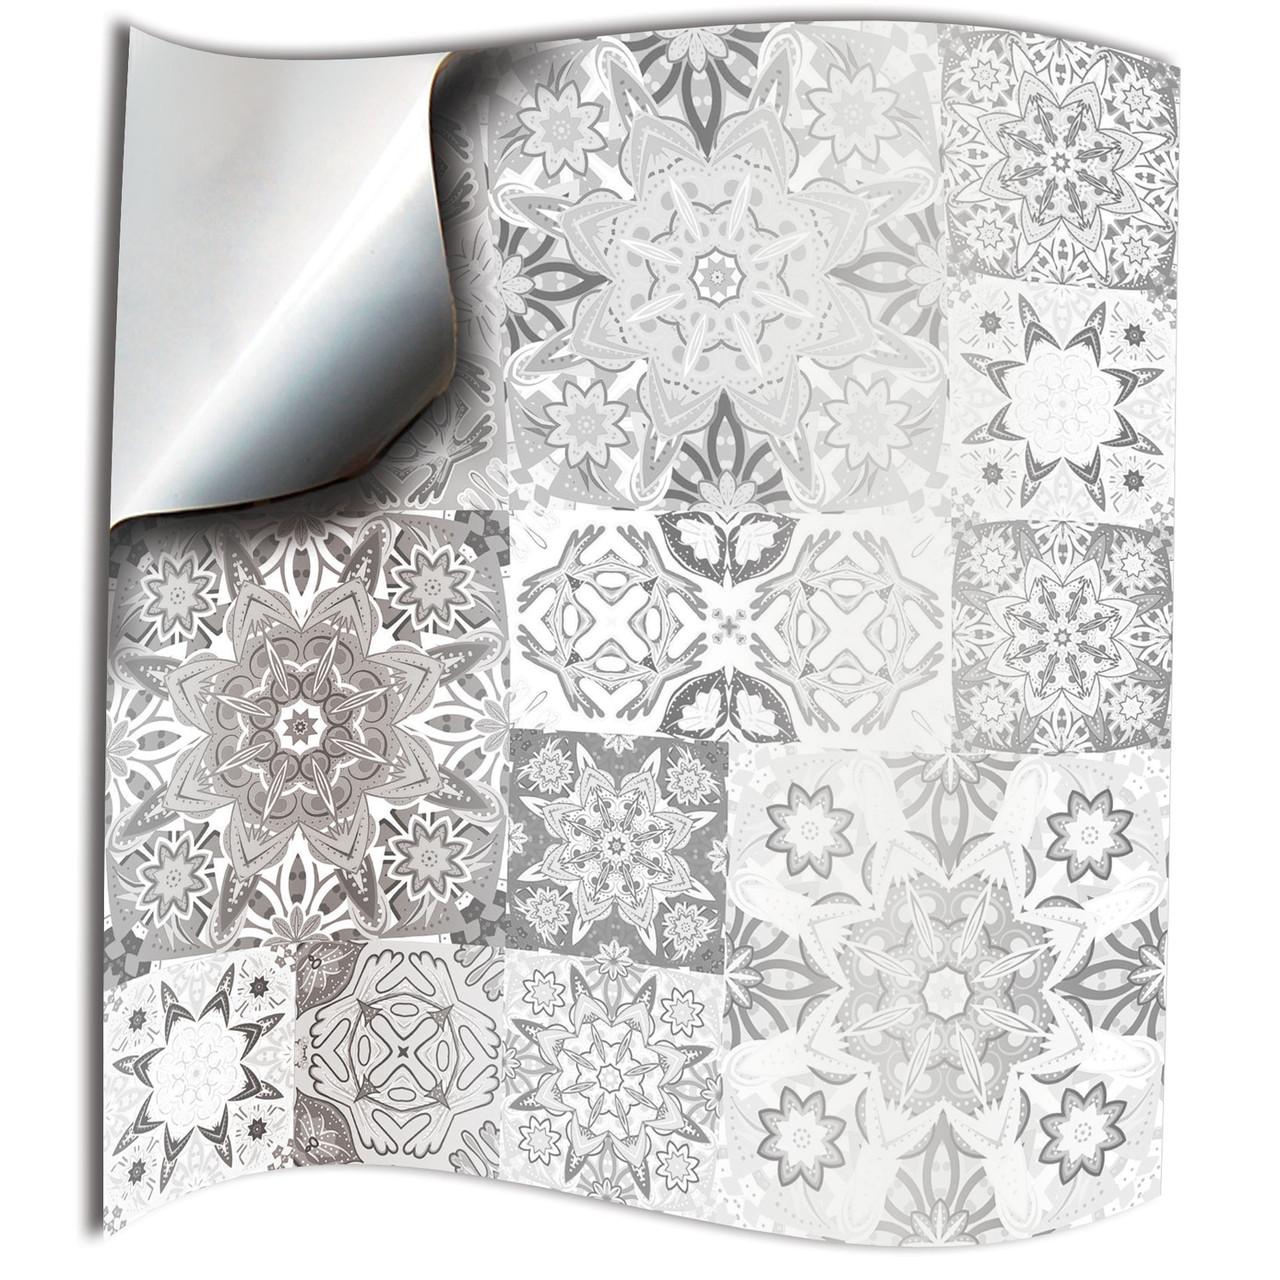 24 white grey moroccan kitchen wall tile stickers 6x6 4x4 for bathroom backslash 10x10 15x15cm tile